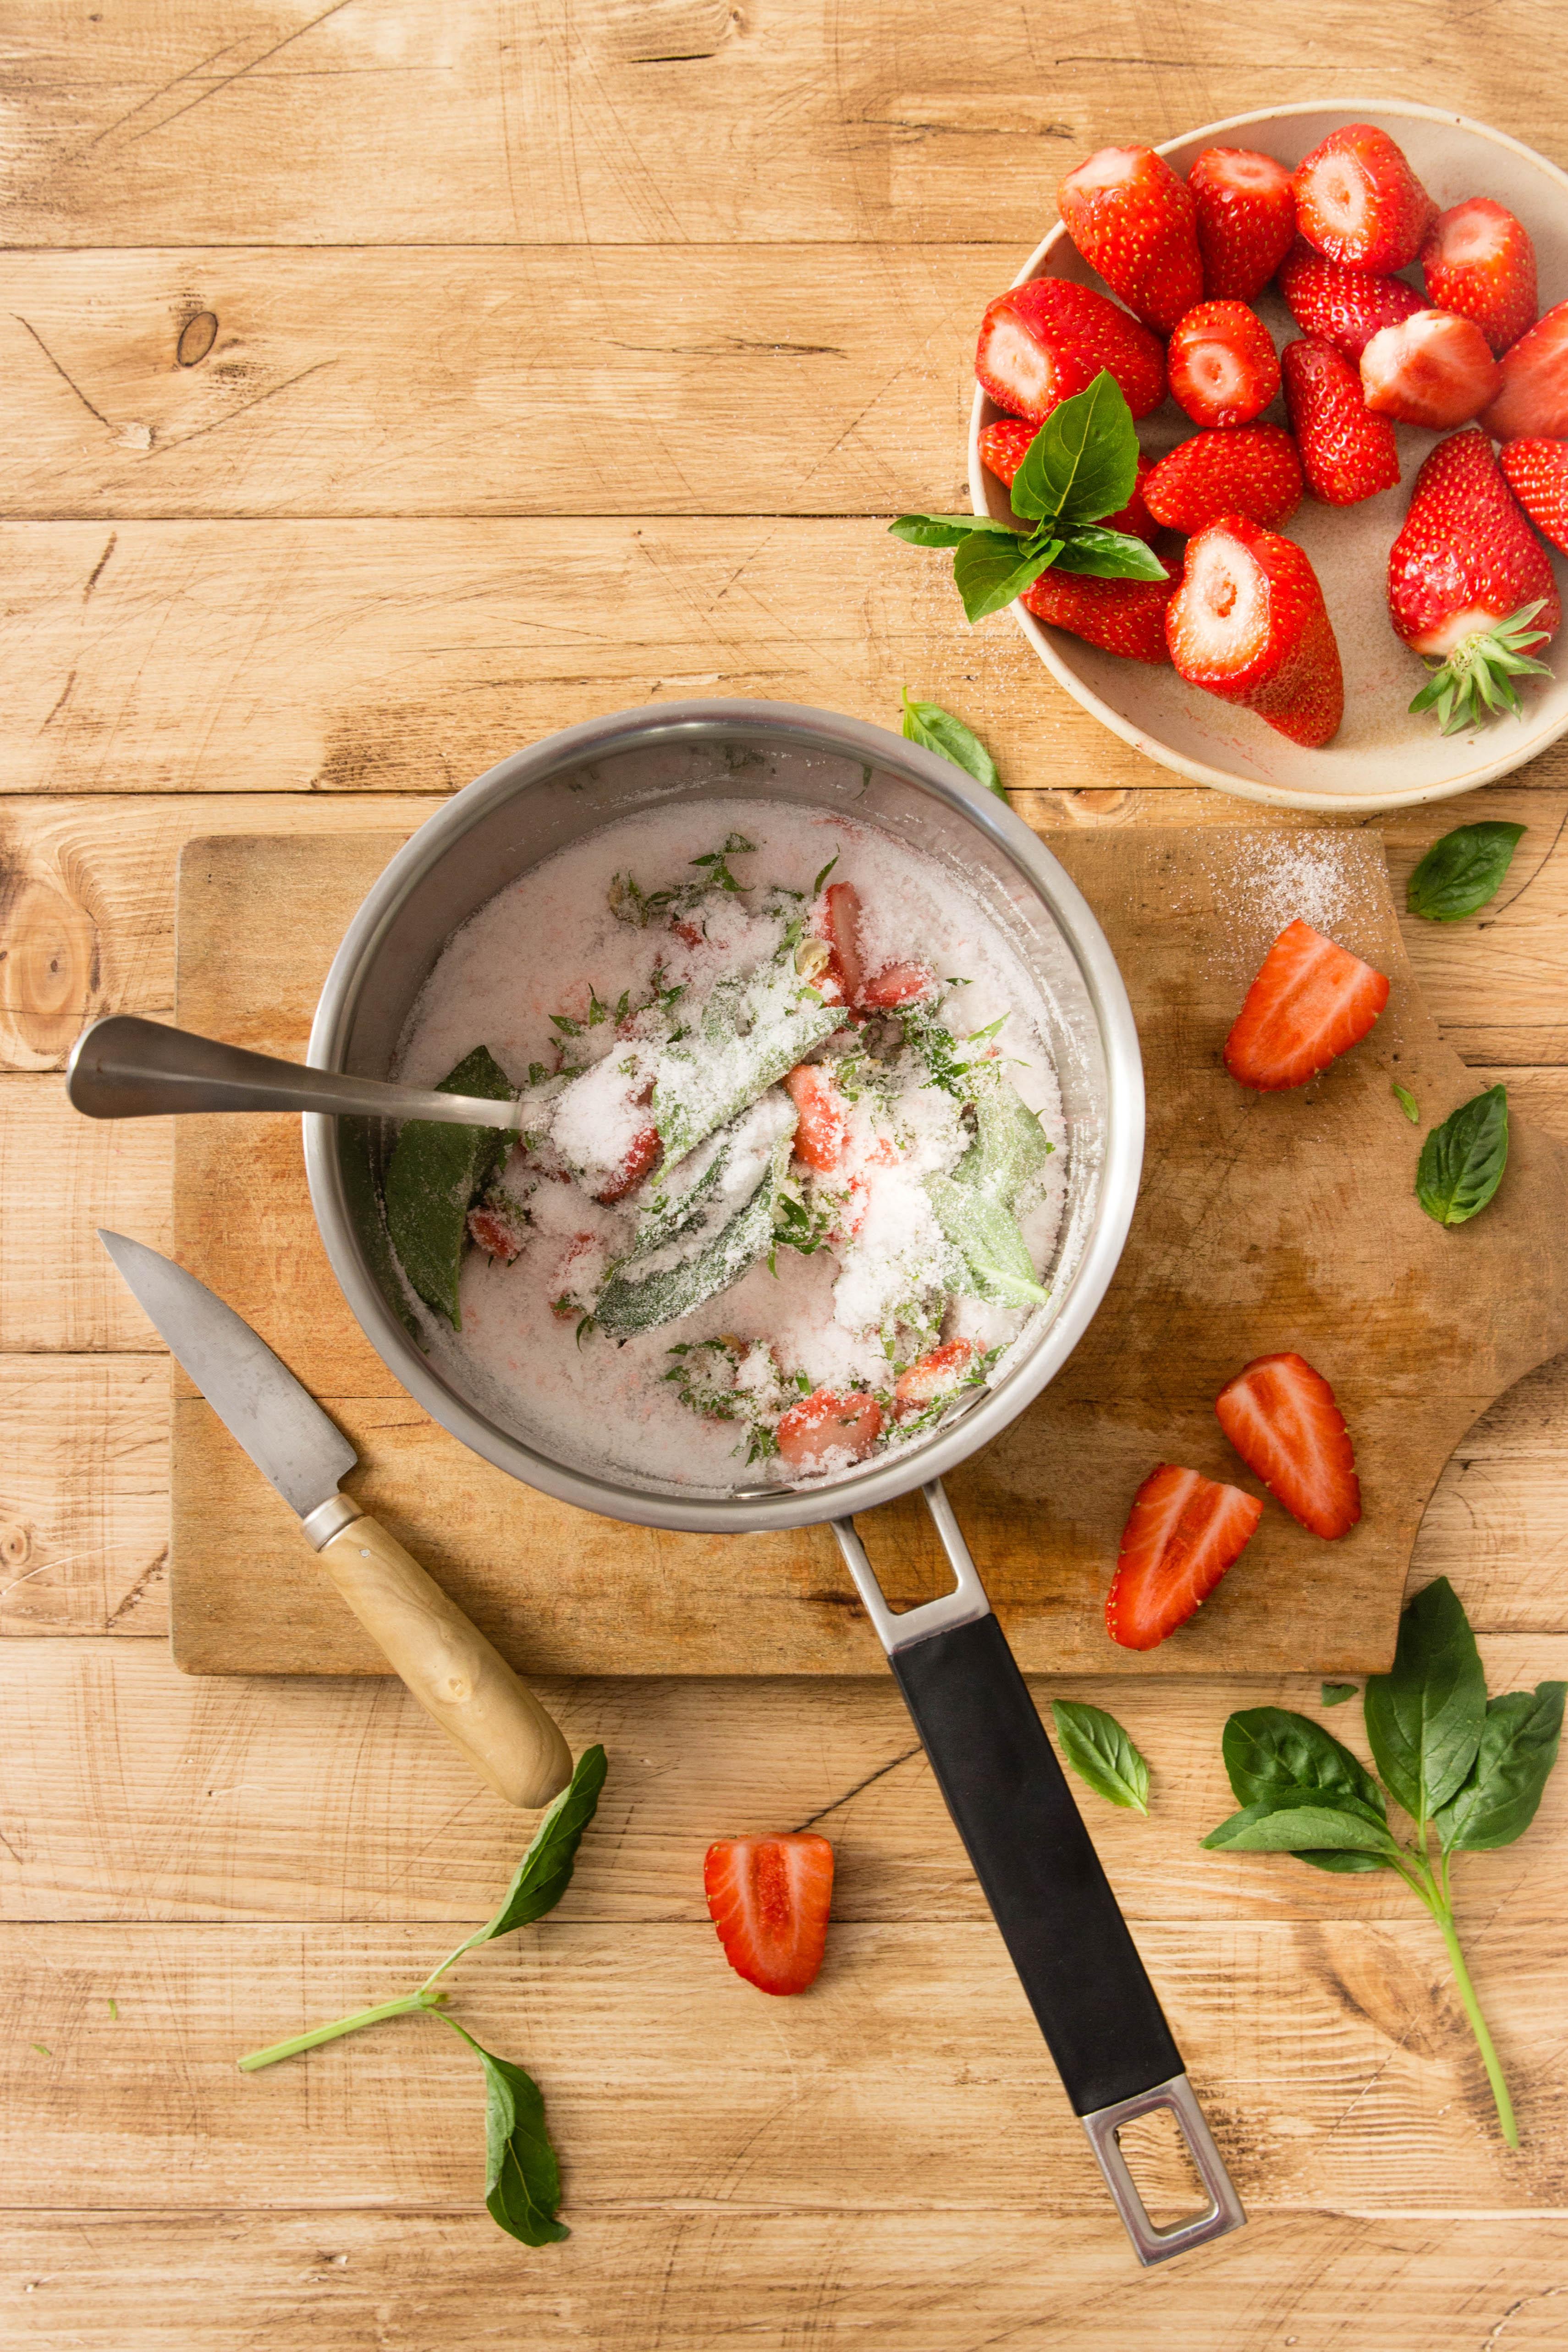 Sirop de queues de fraises antigaspi - Quoi faire avec des queues de fraises ? DIY photography